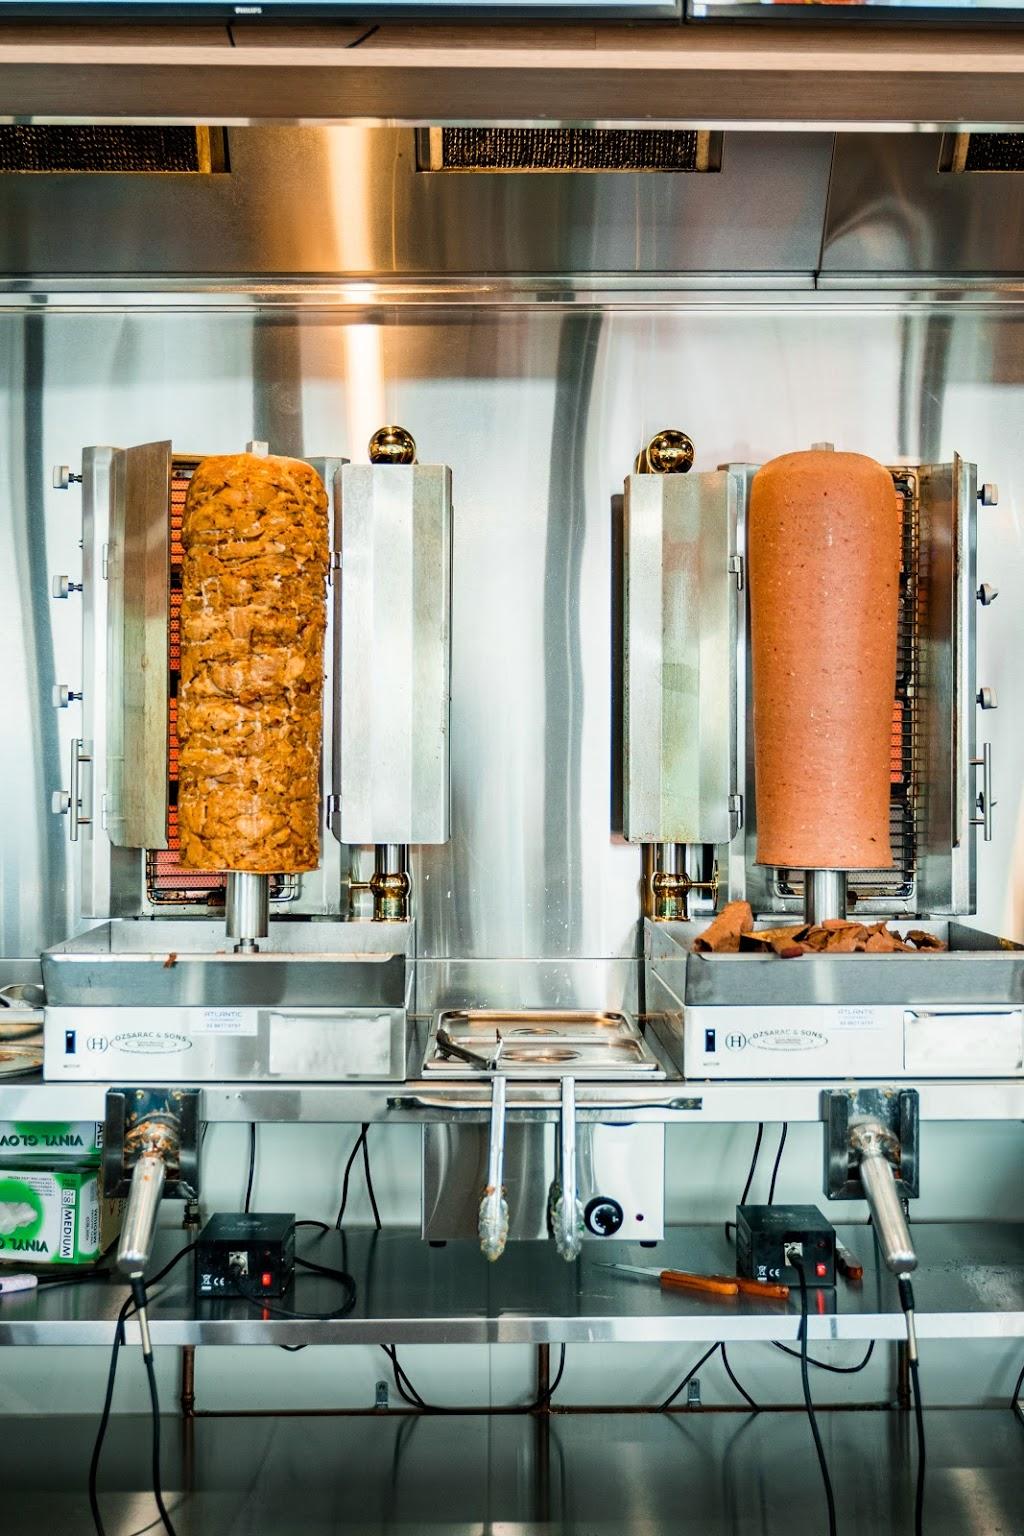 Prospect Kebab House | restaurant | Shop 2/6 Myrtle St, Prospect NSW 2148, Australia | 0296797269 OR +61 2 9679 7269